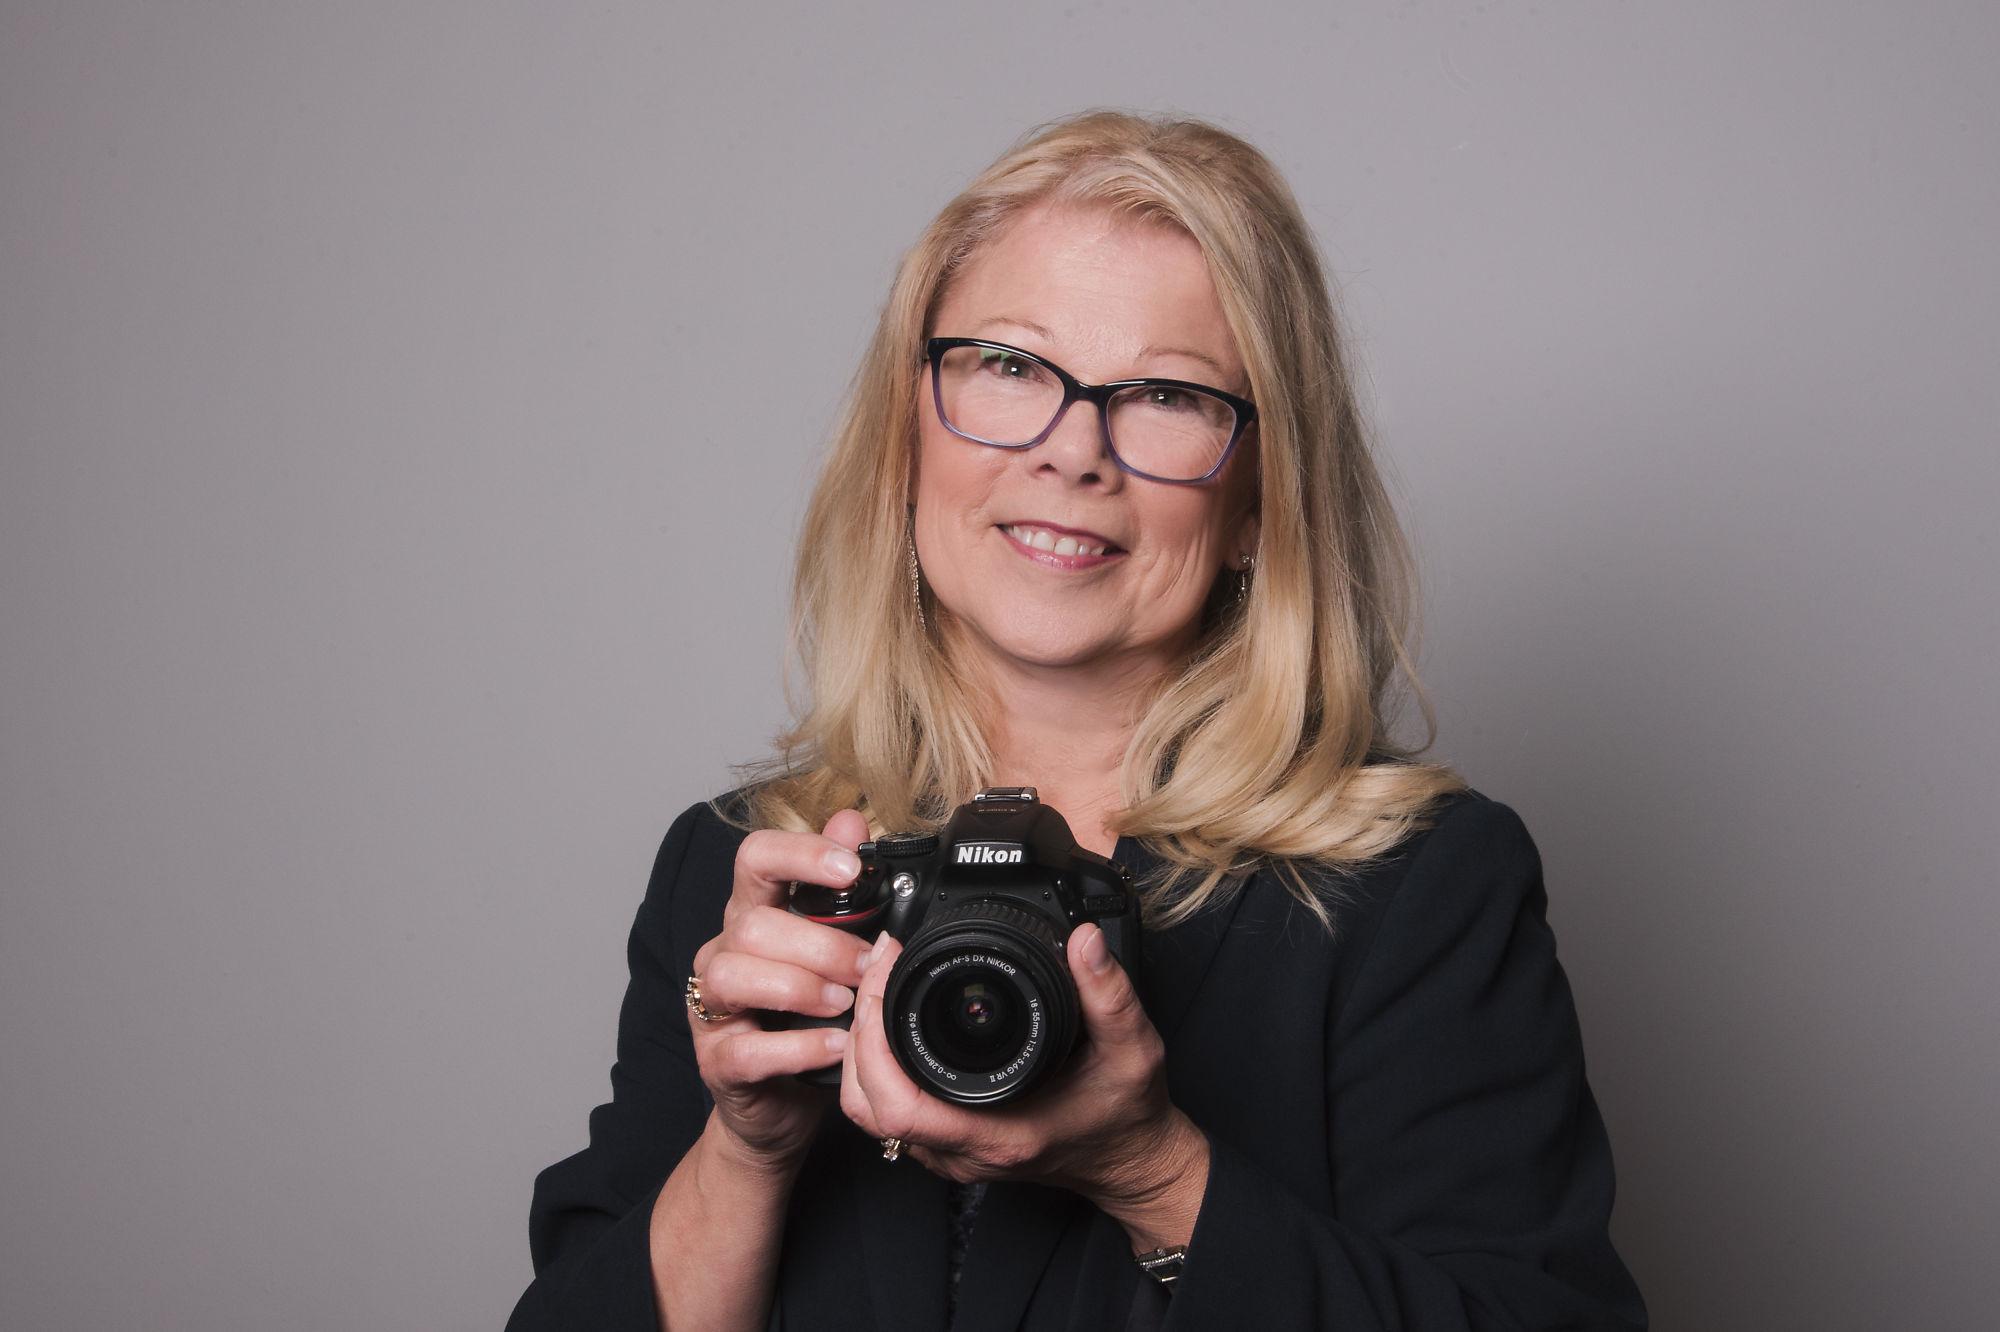 Karen Koebel-Medlicott